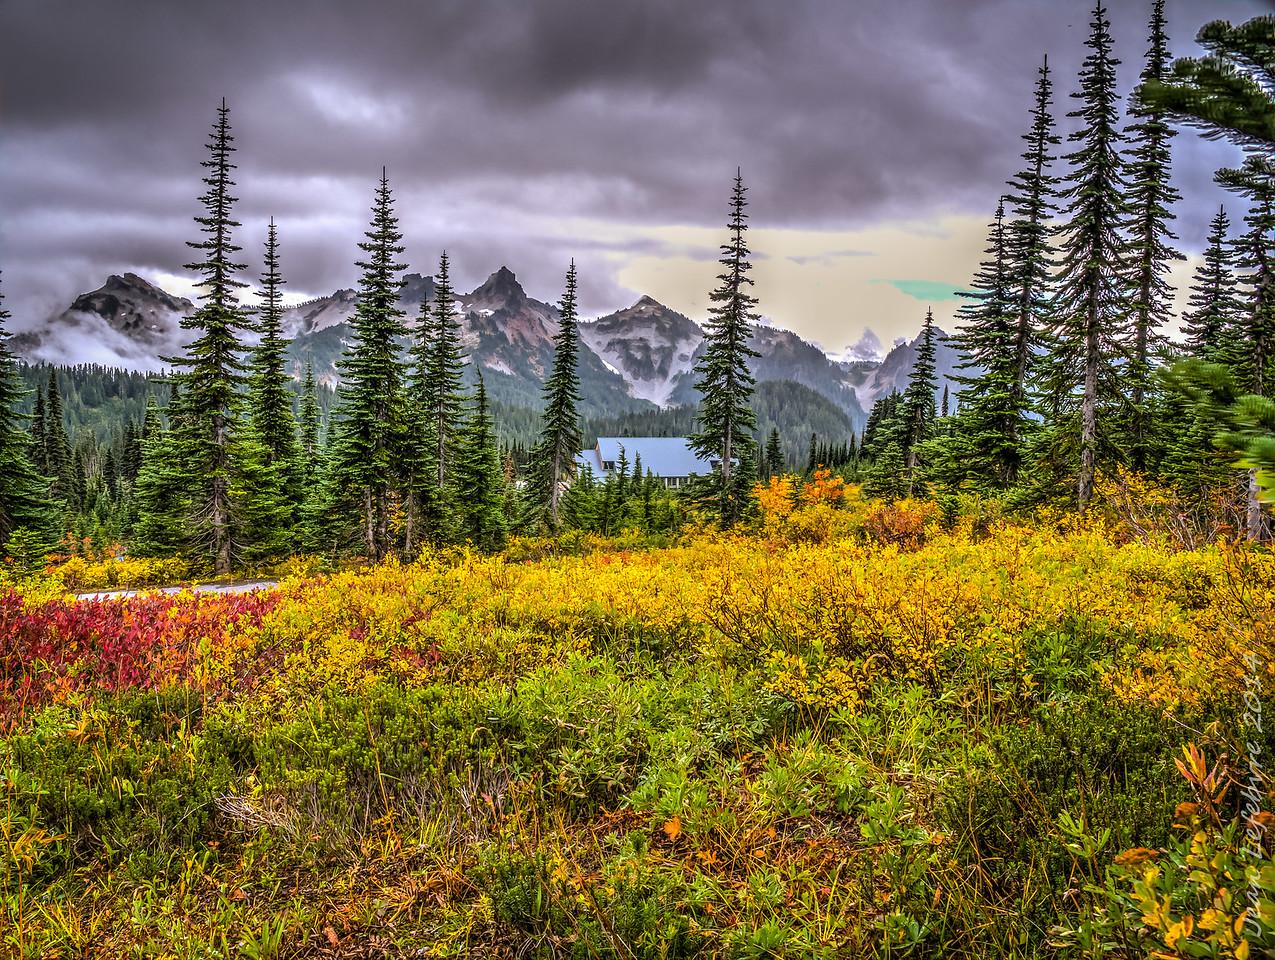 Mount_Rainier_362of15-141012-248_HDR